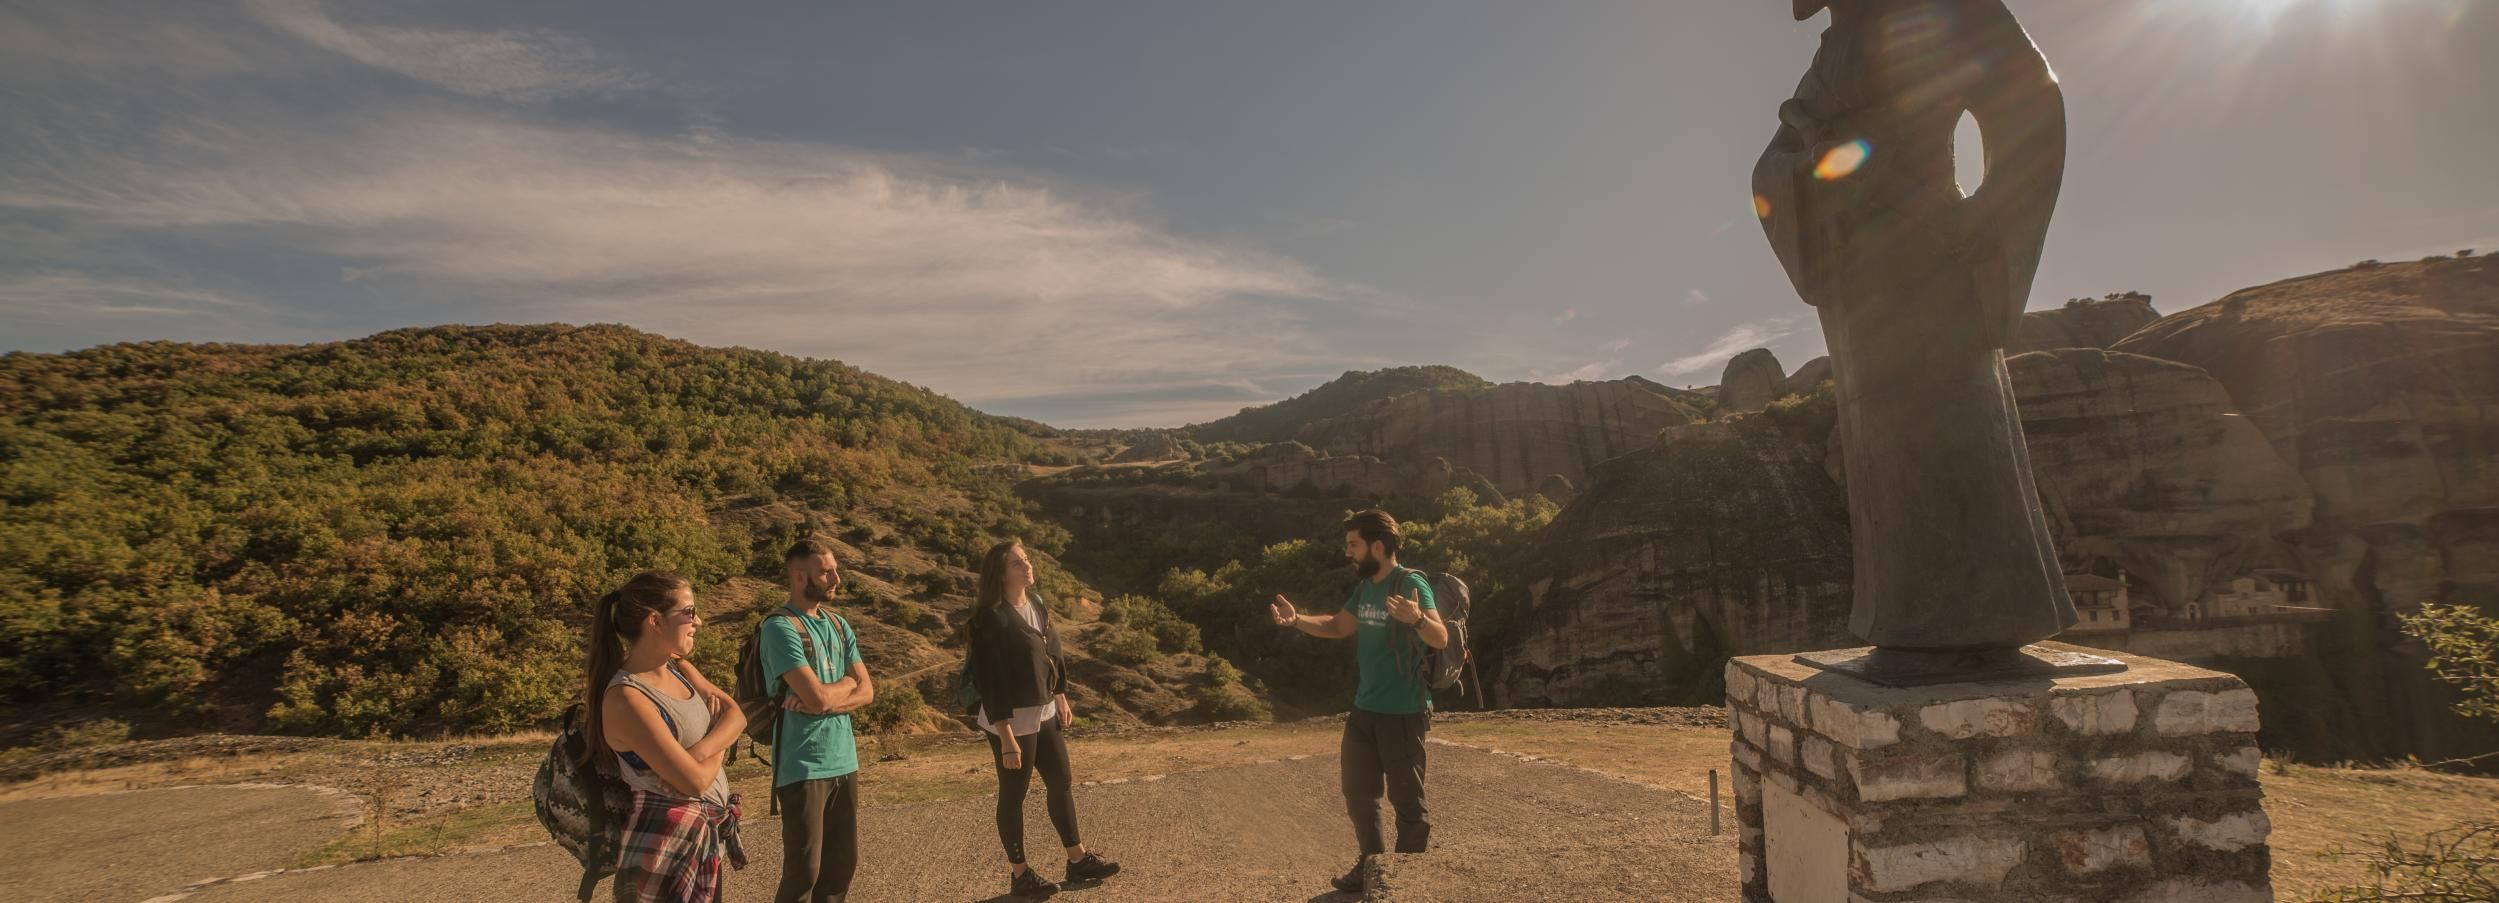 Meteora: Hiking Tour to the Monasteries